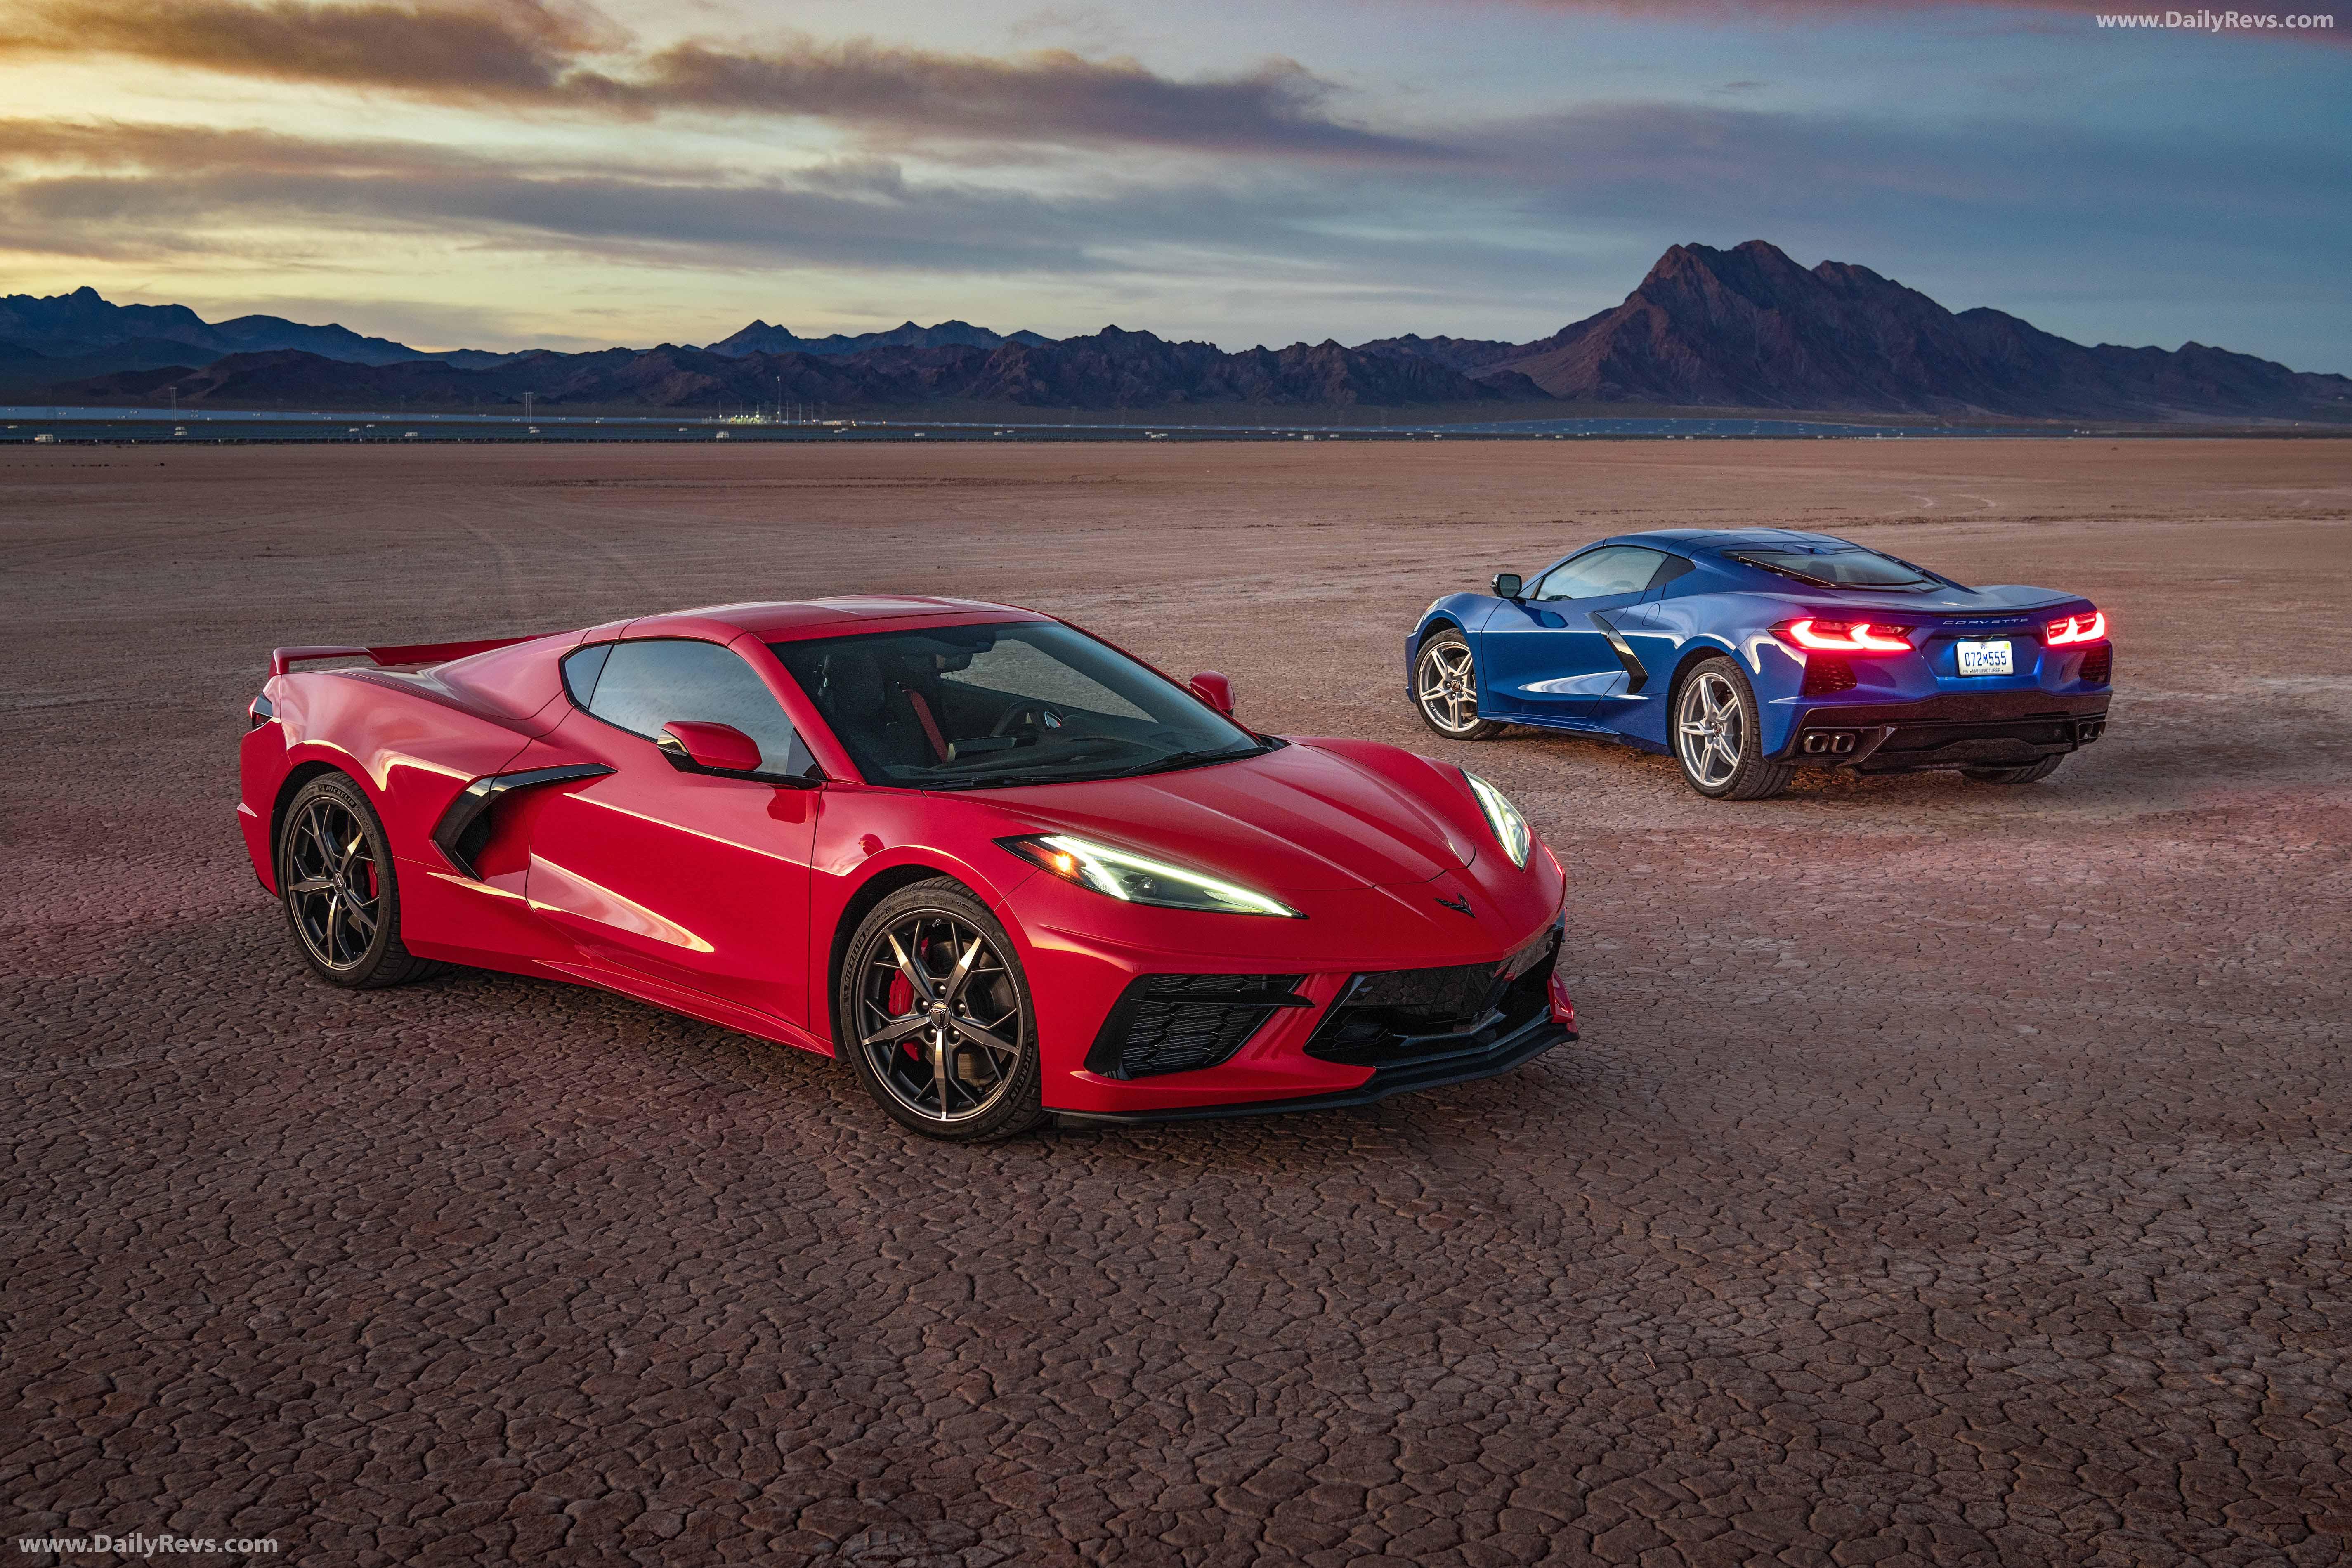 2020 Chevrolet Corvette C8 Stingray - HD Pictures, Videos ...